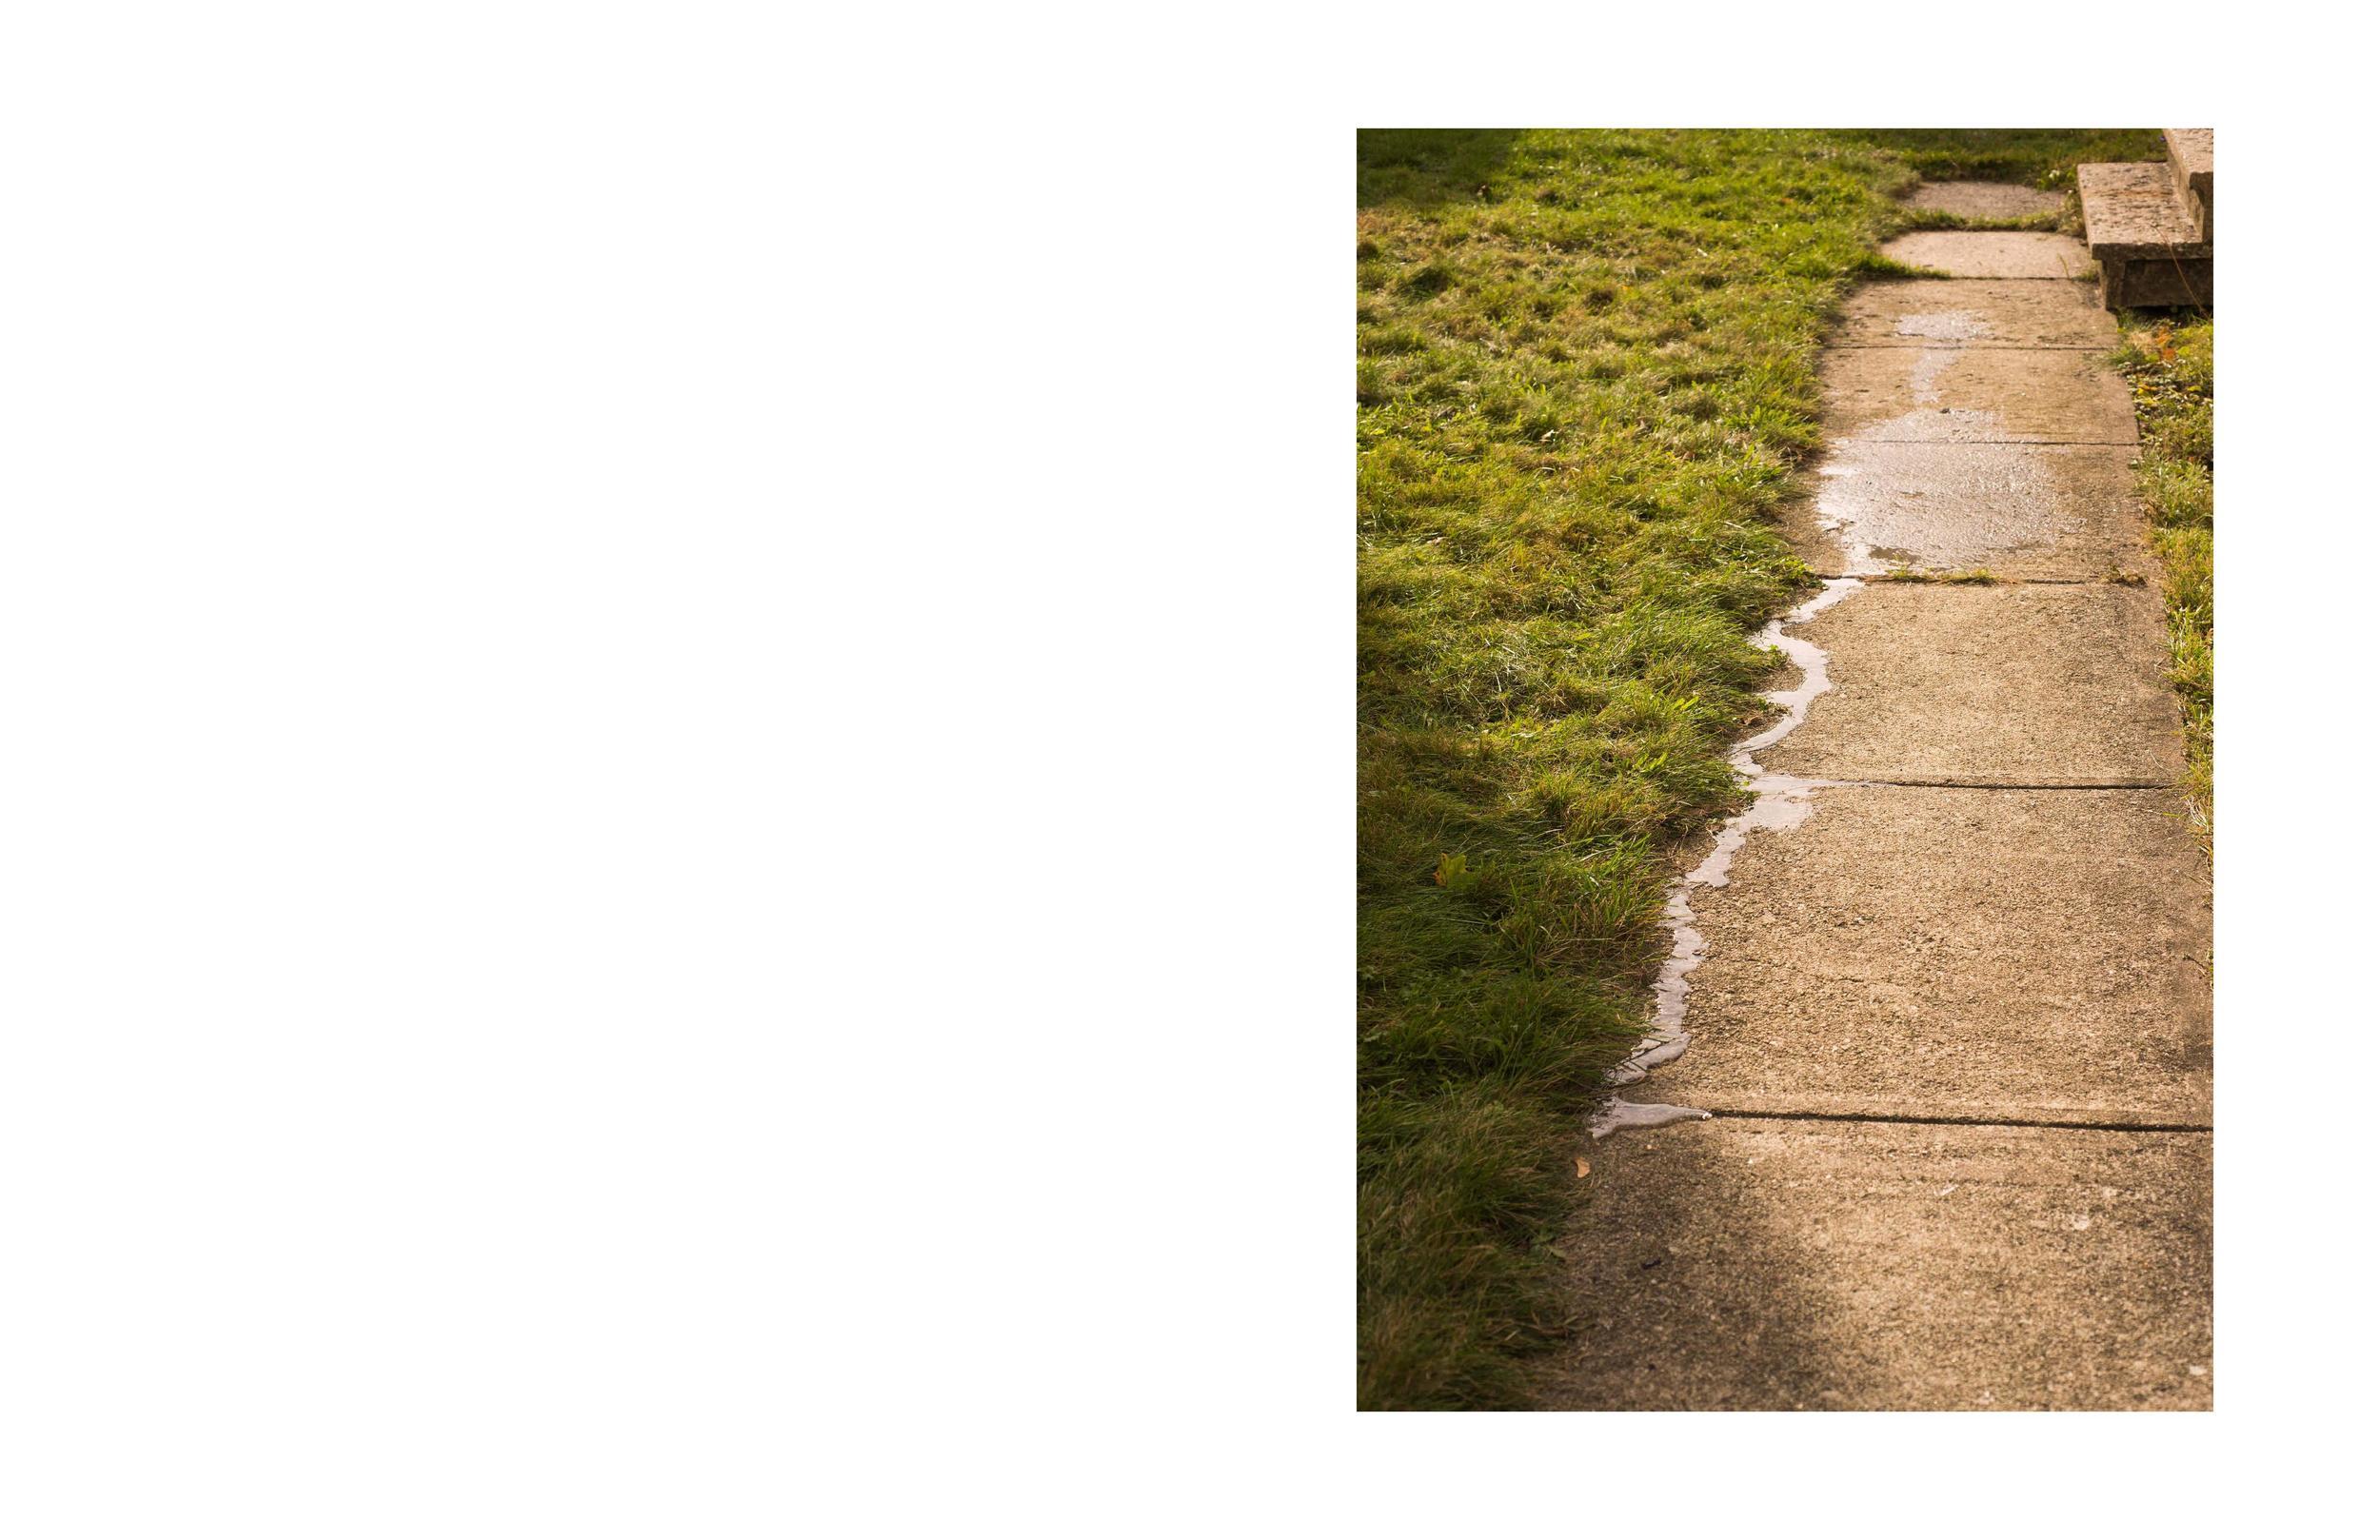 Vivian Ewing_Dry Grass Crackling-page-007.jpg